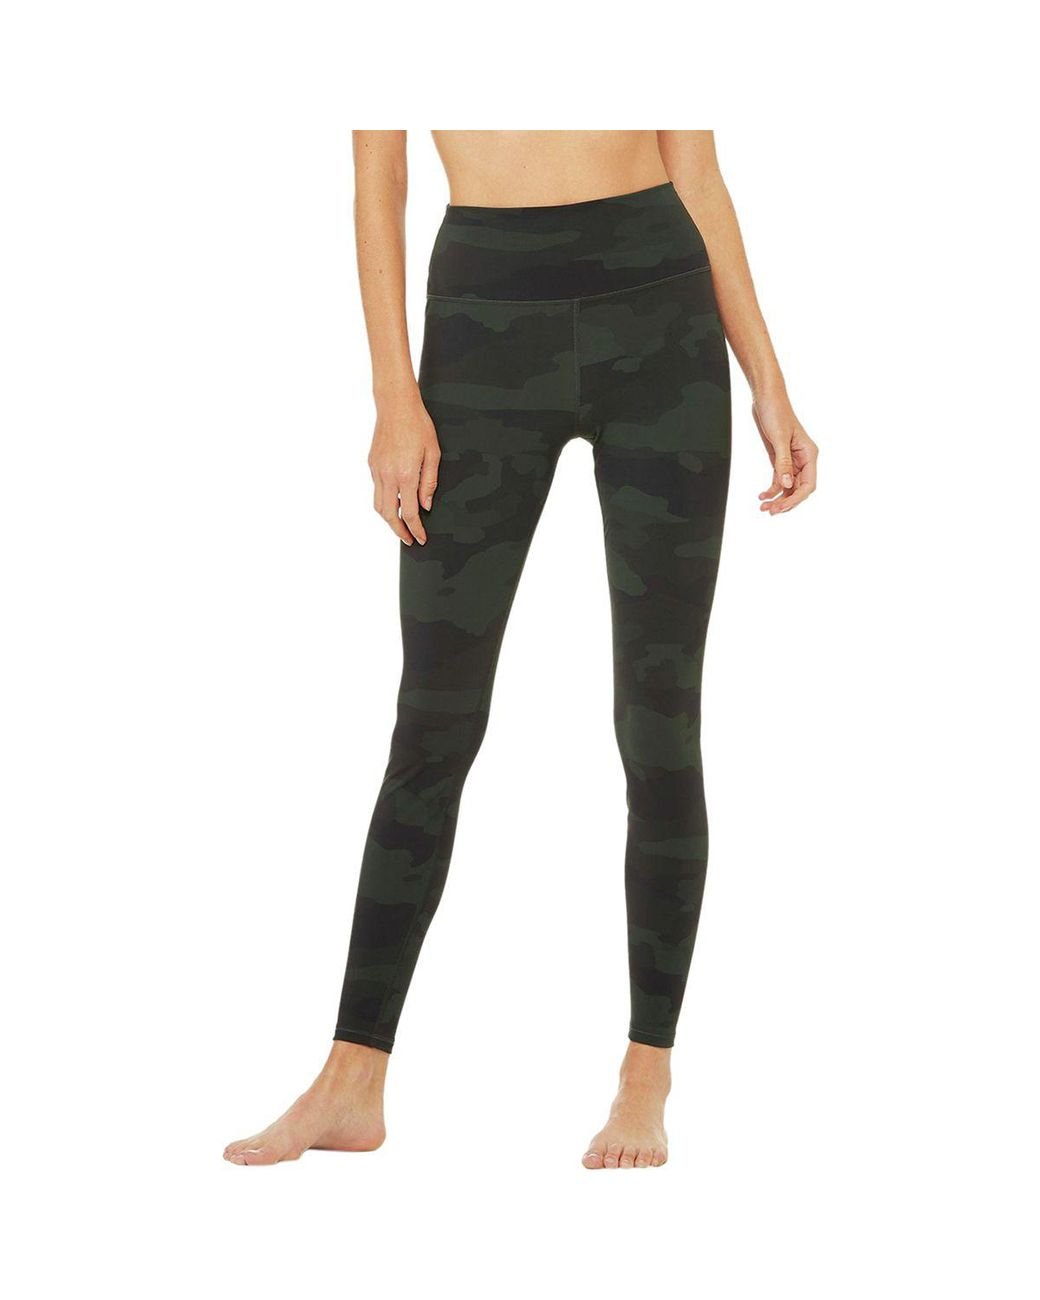 f6215c4a0dabed Alo Yoga High-waist Vapor Legging in Black - Save 6% - Lyst